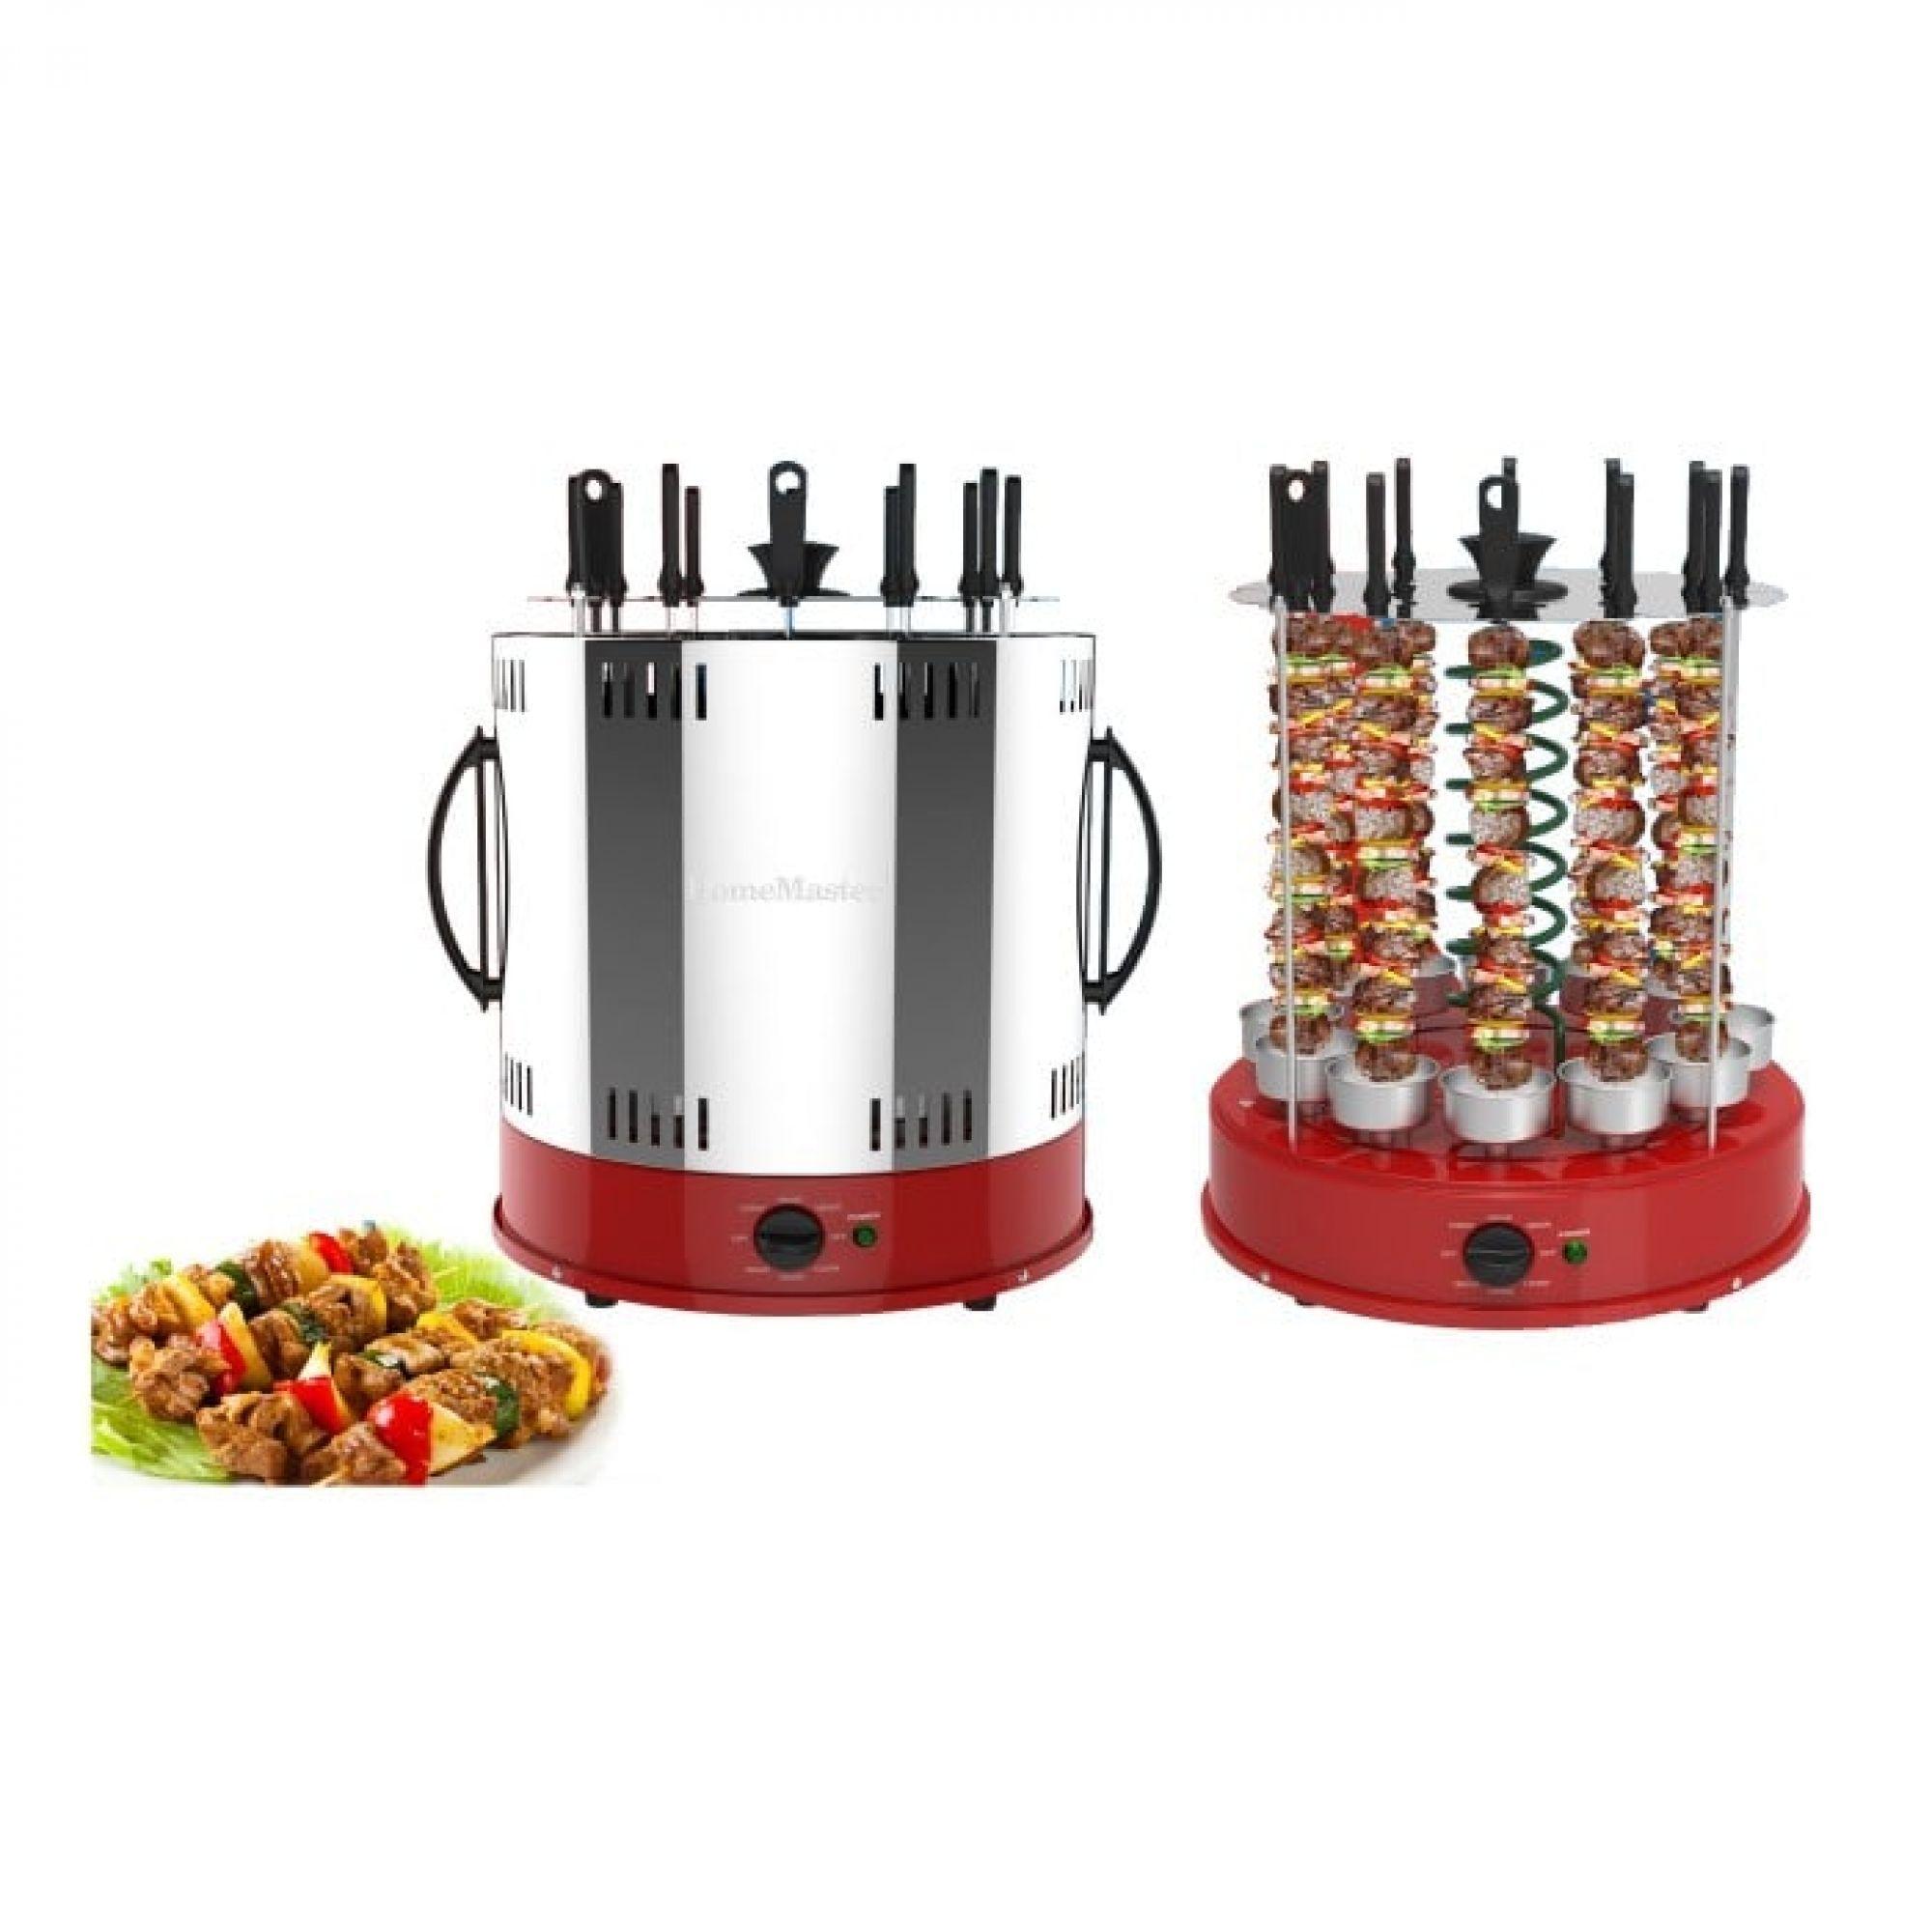 شواية لحم كهربائية تحتوي على 12 سيخ كبير Cooking Cook Meat لحوم مشويات مشاوي مشوي Coffee Maker Coffee French Press